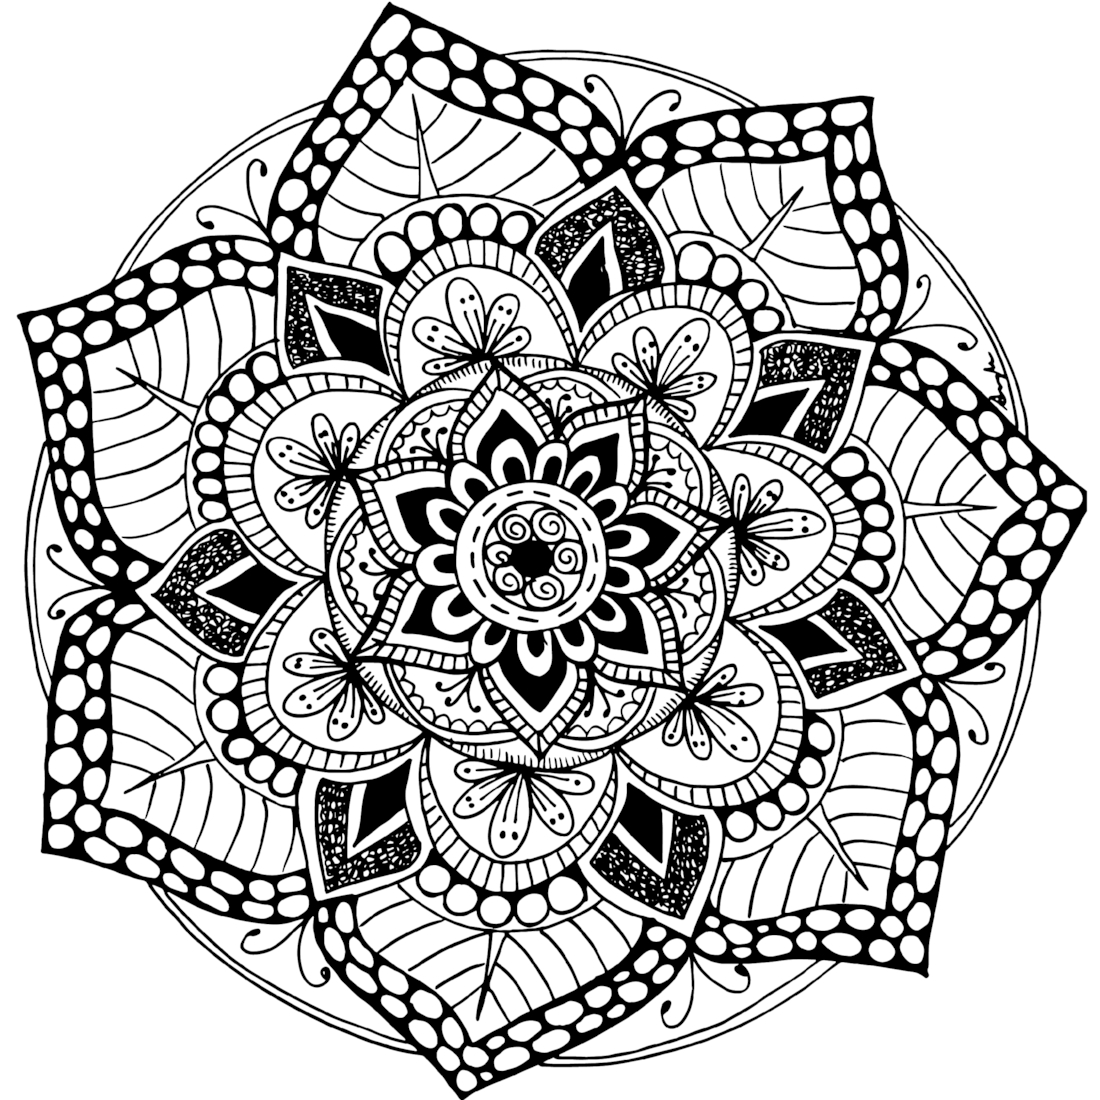 A Free Printable Mandala Coloring Page. 60+ More Available On - Free Printable Mandalas